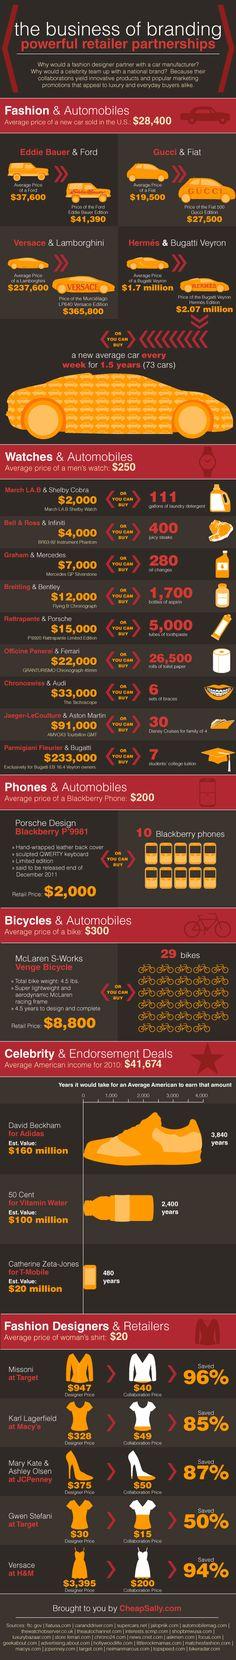 1000+ images about Social Media | Digital Marketing | Mobile on ...